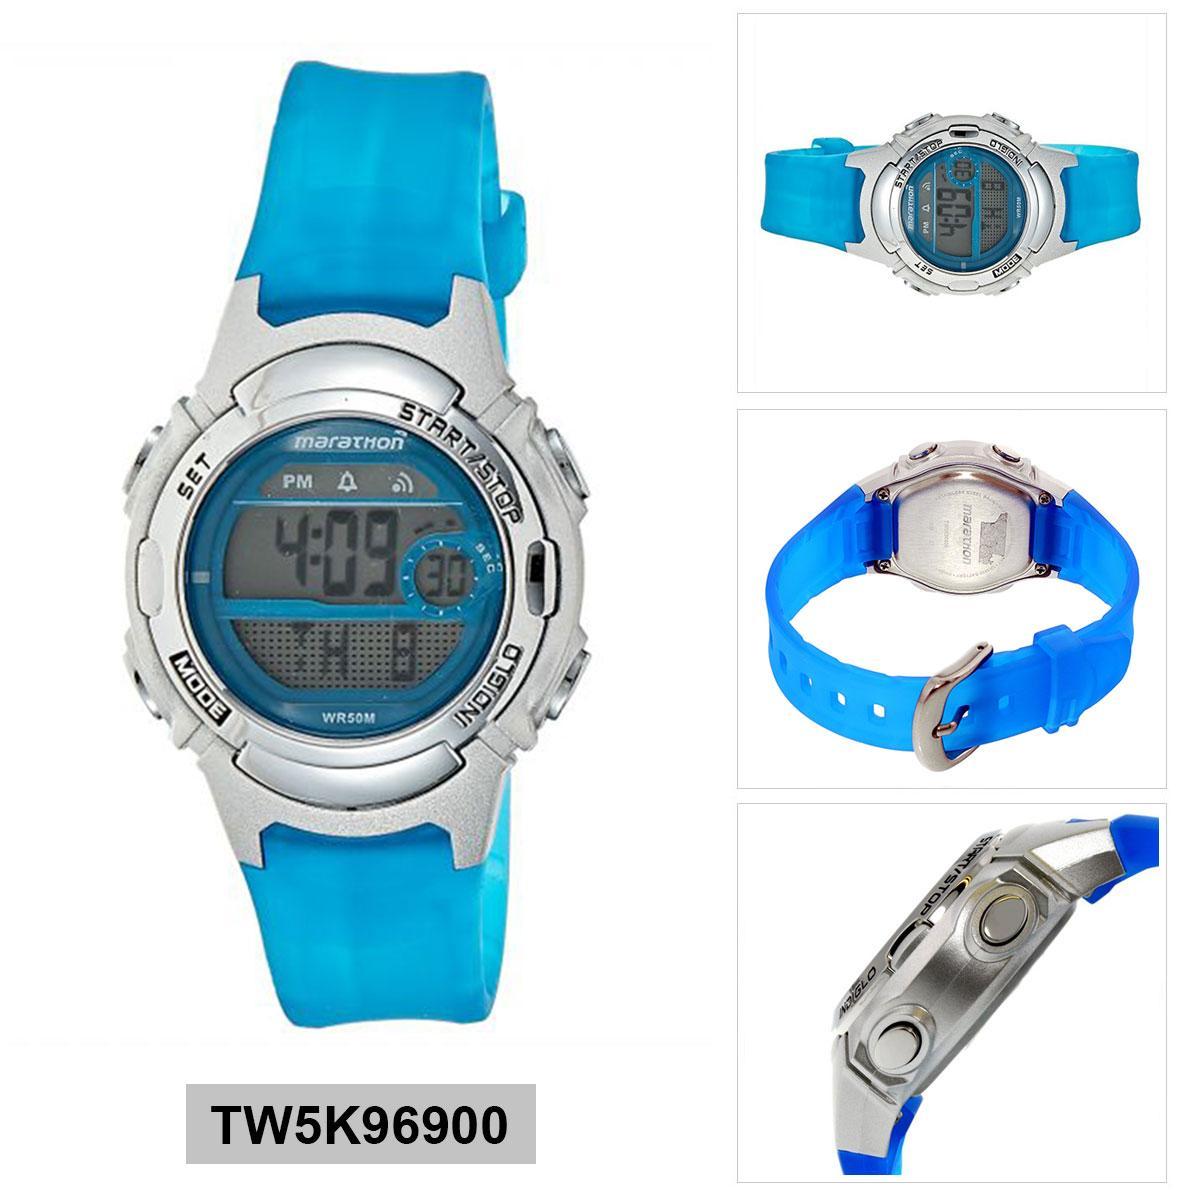 12f65b2d0 Timex Marathon Blue Resin Case Resin Strap Ladies TW5K96900